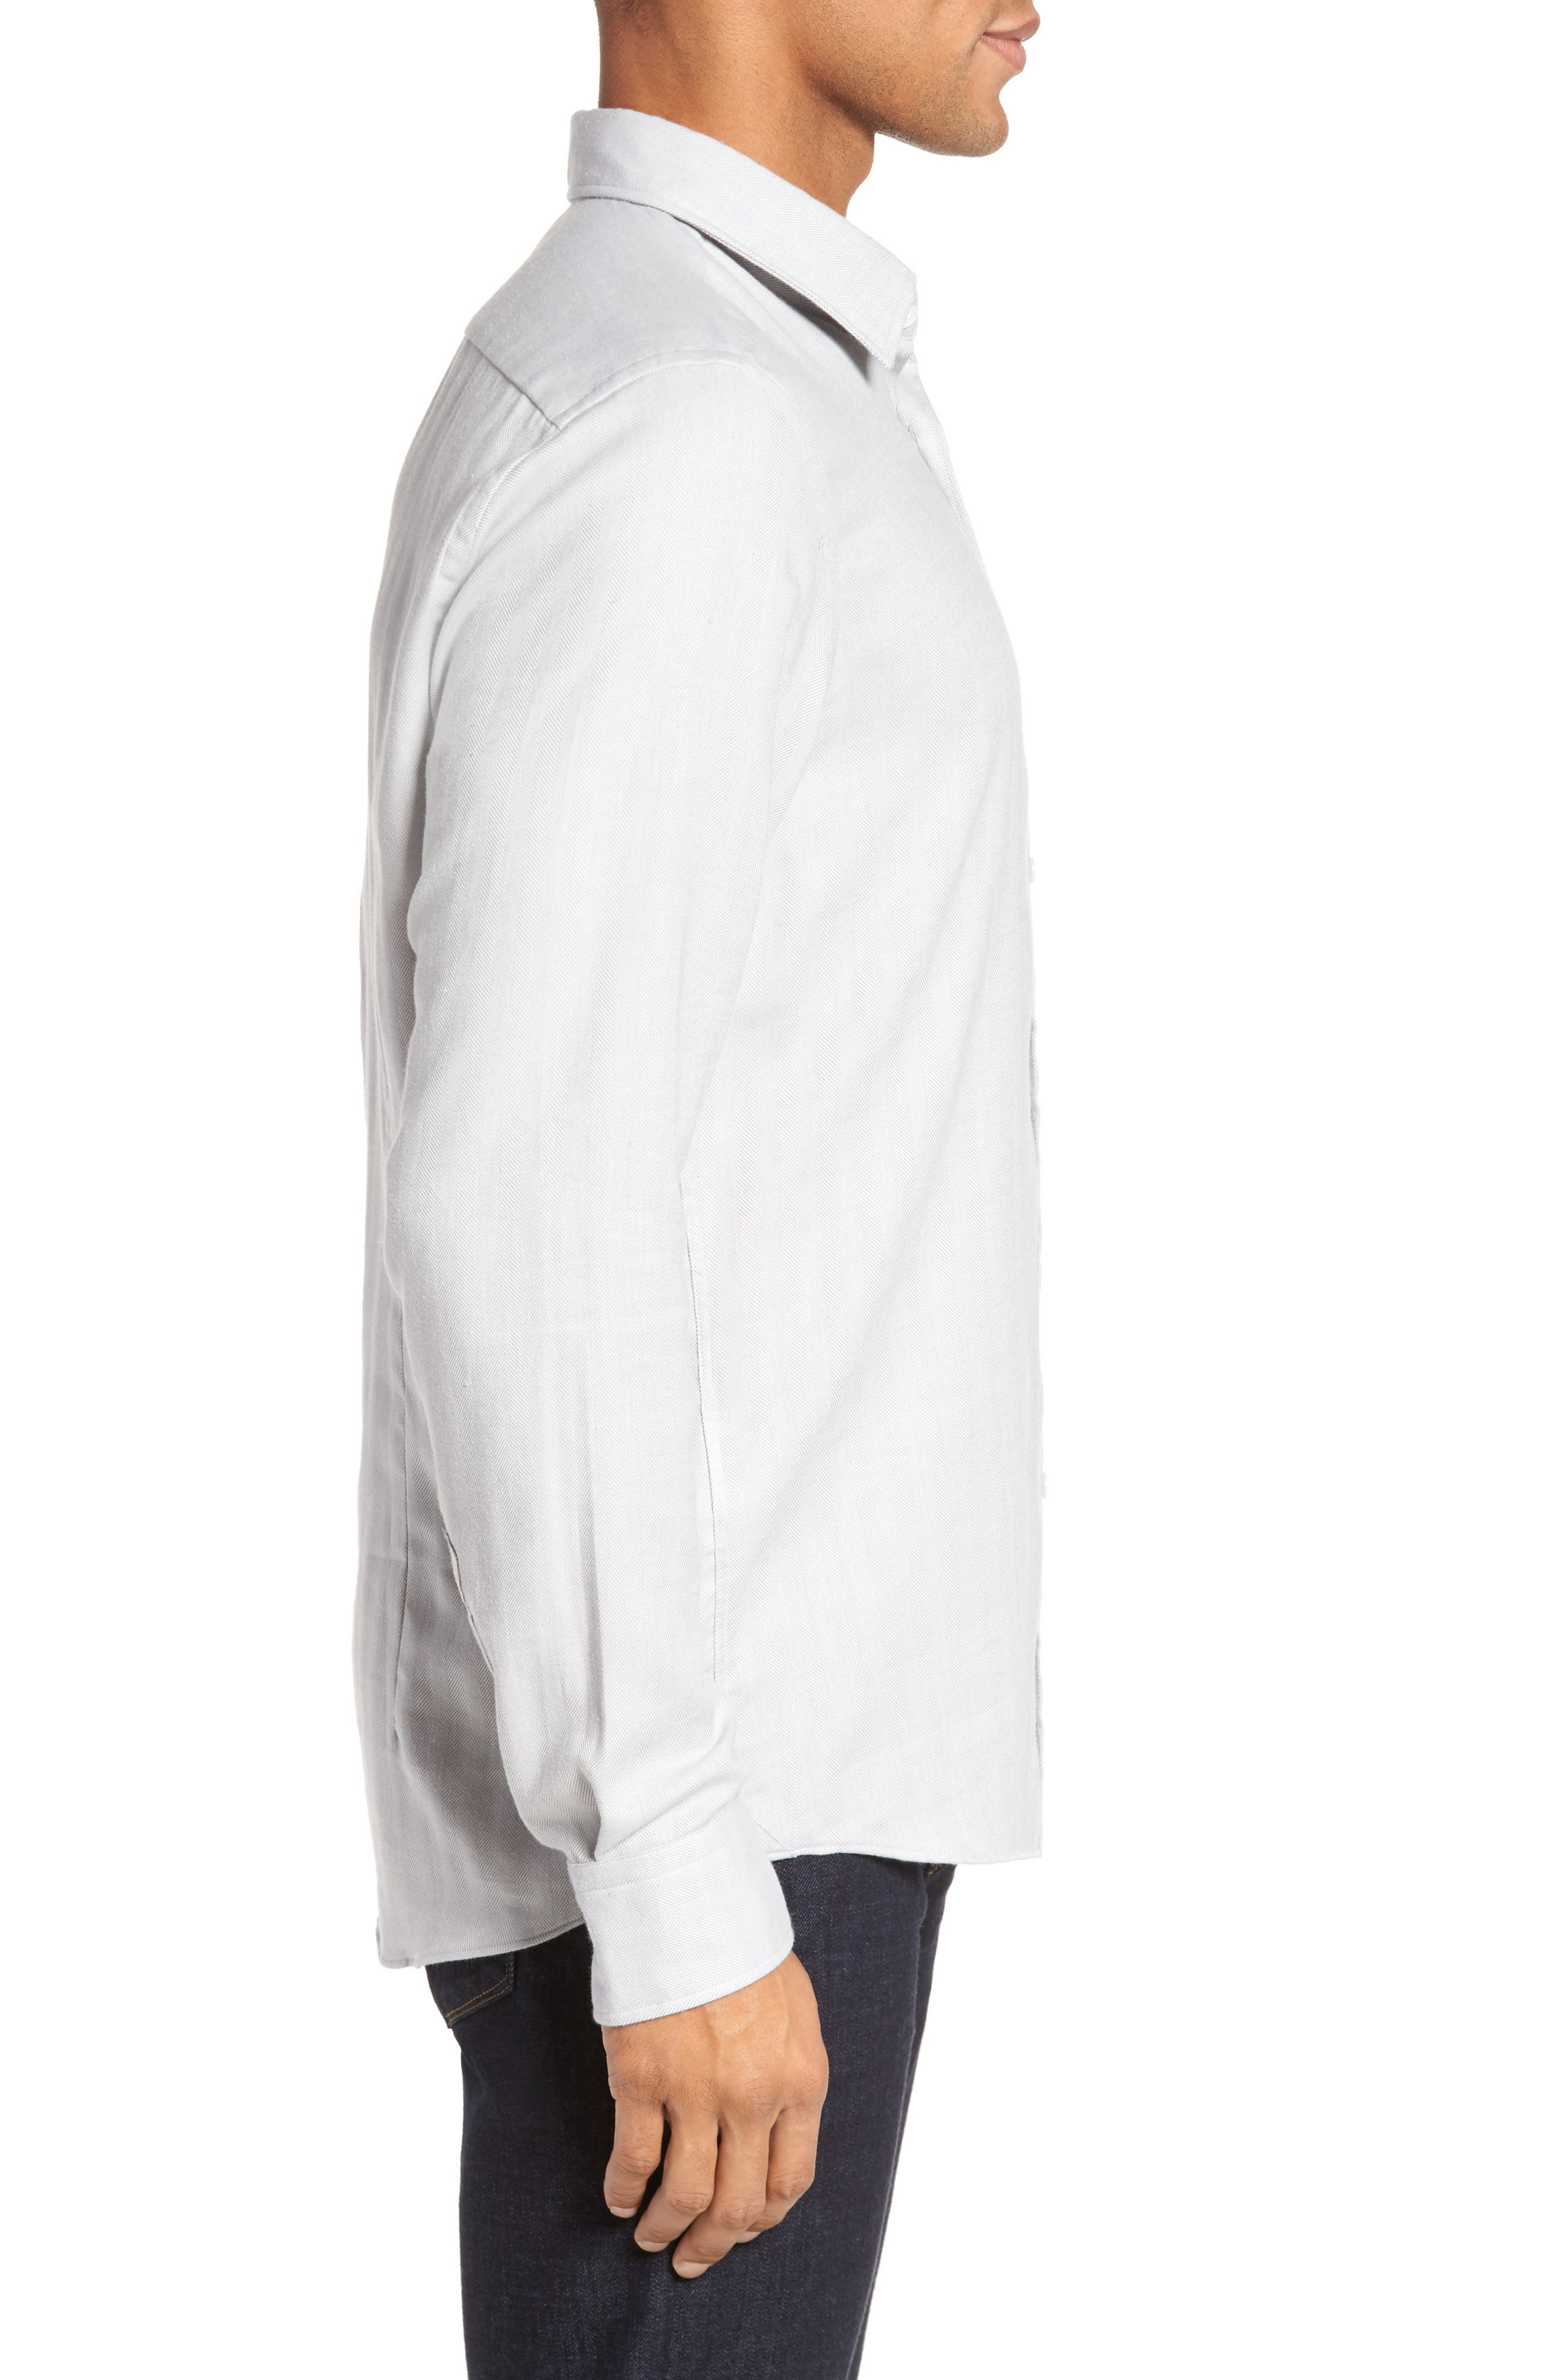 Landon Herringbone Shirt,                             Alternate thumbnail 3, color,                             Grey